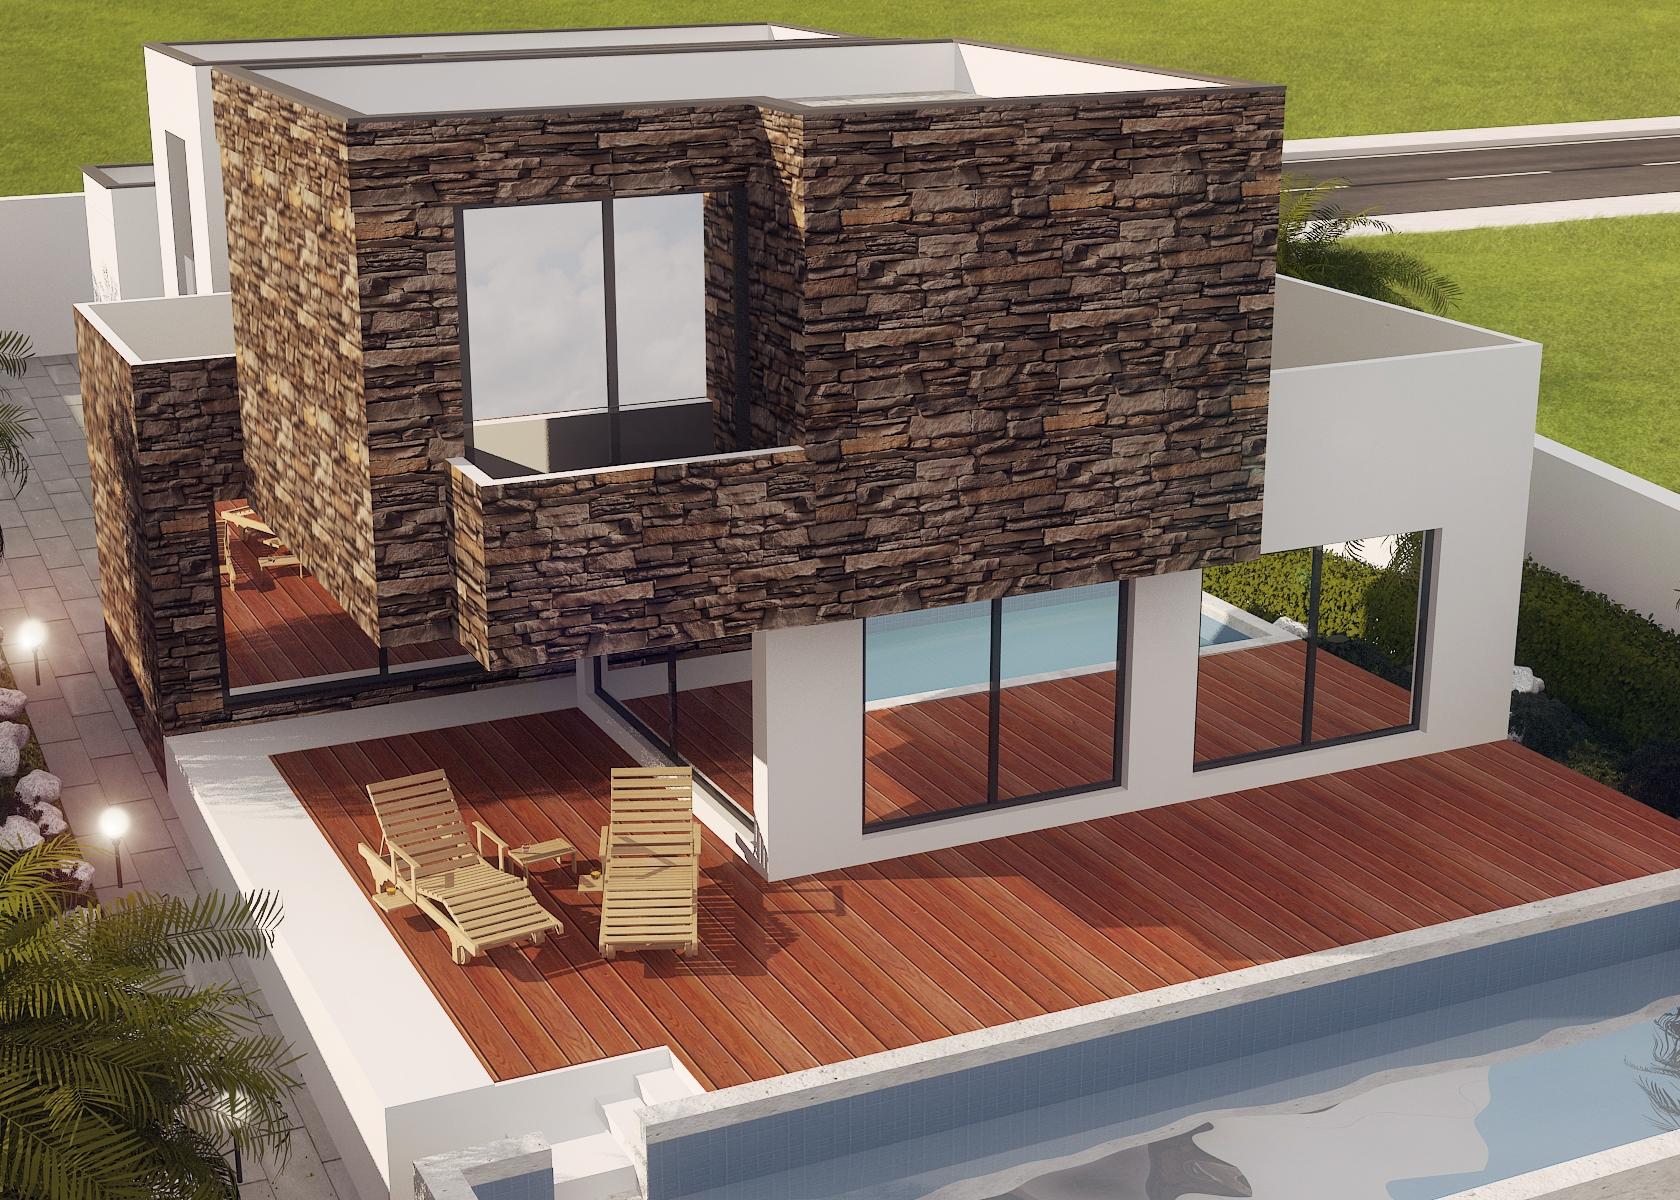 Modern Contemporary Design Villa In Beautiful Surroundings